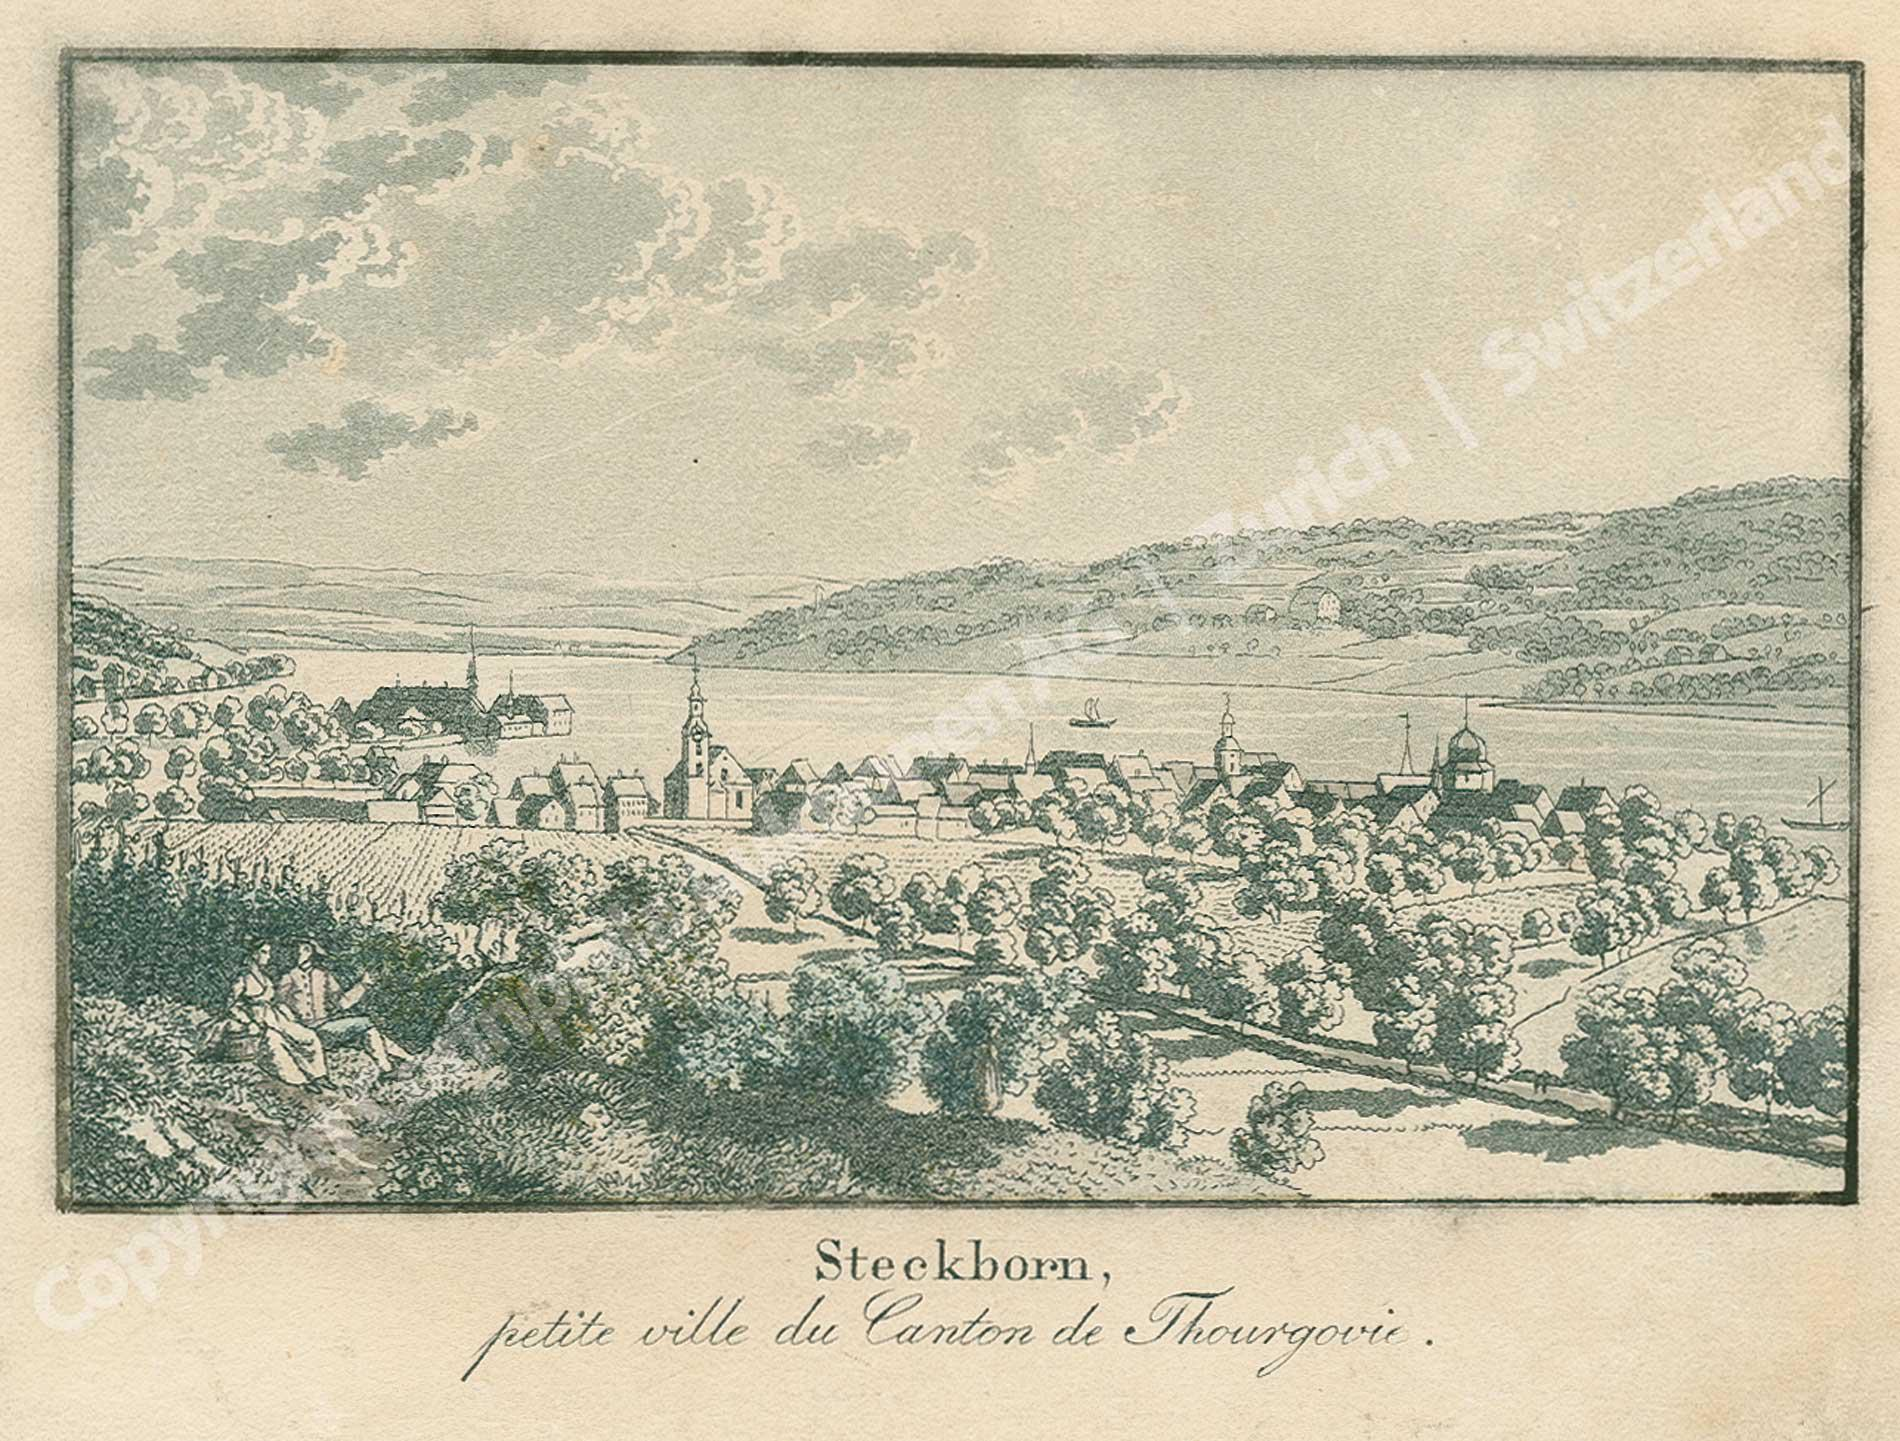 Steckborn